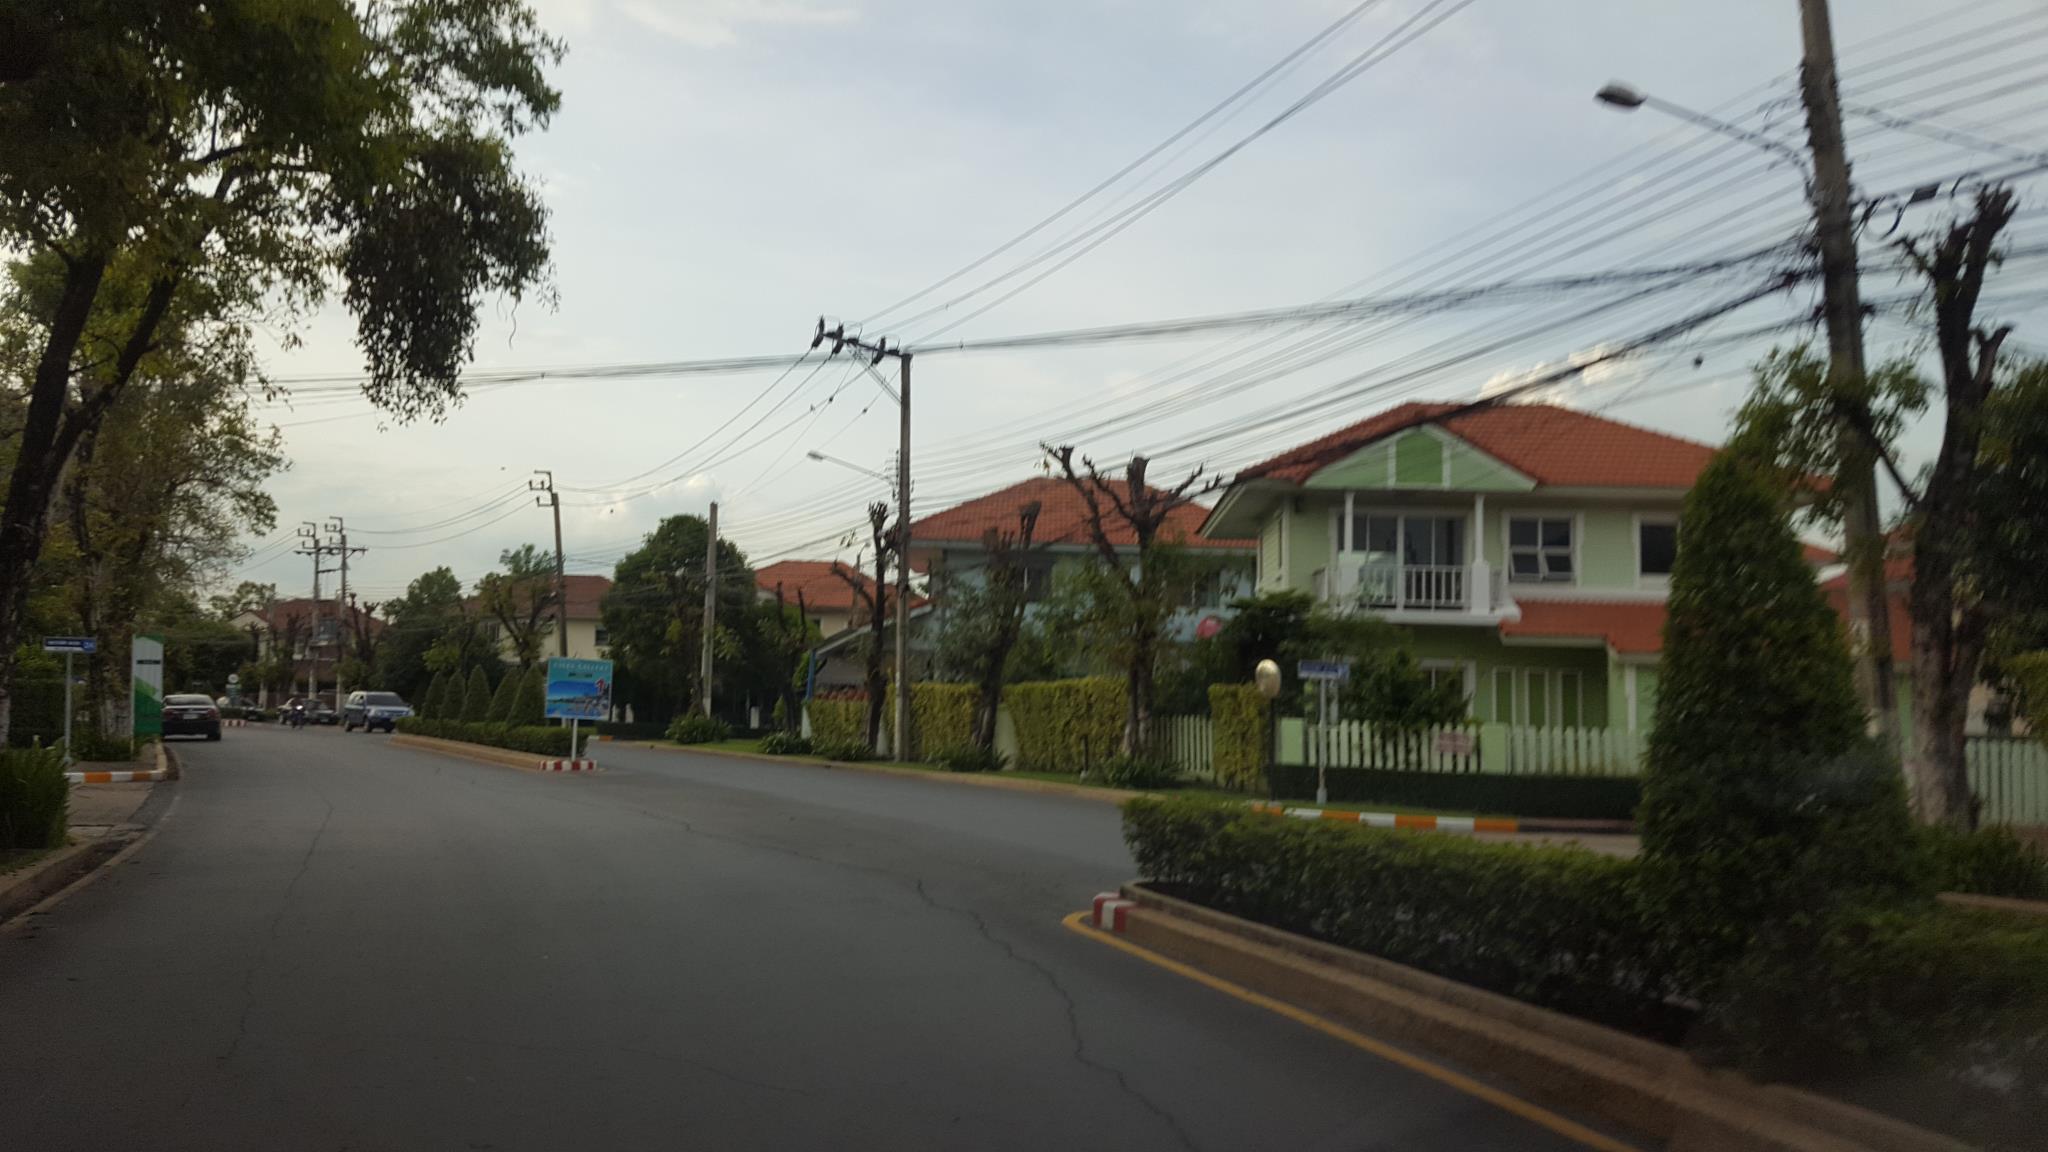 An atmospheric house near the heart of a city